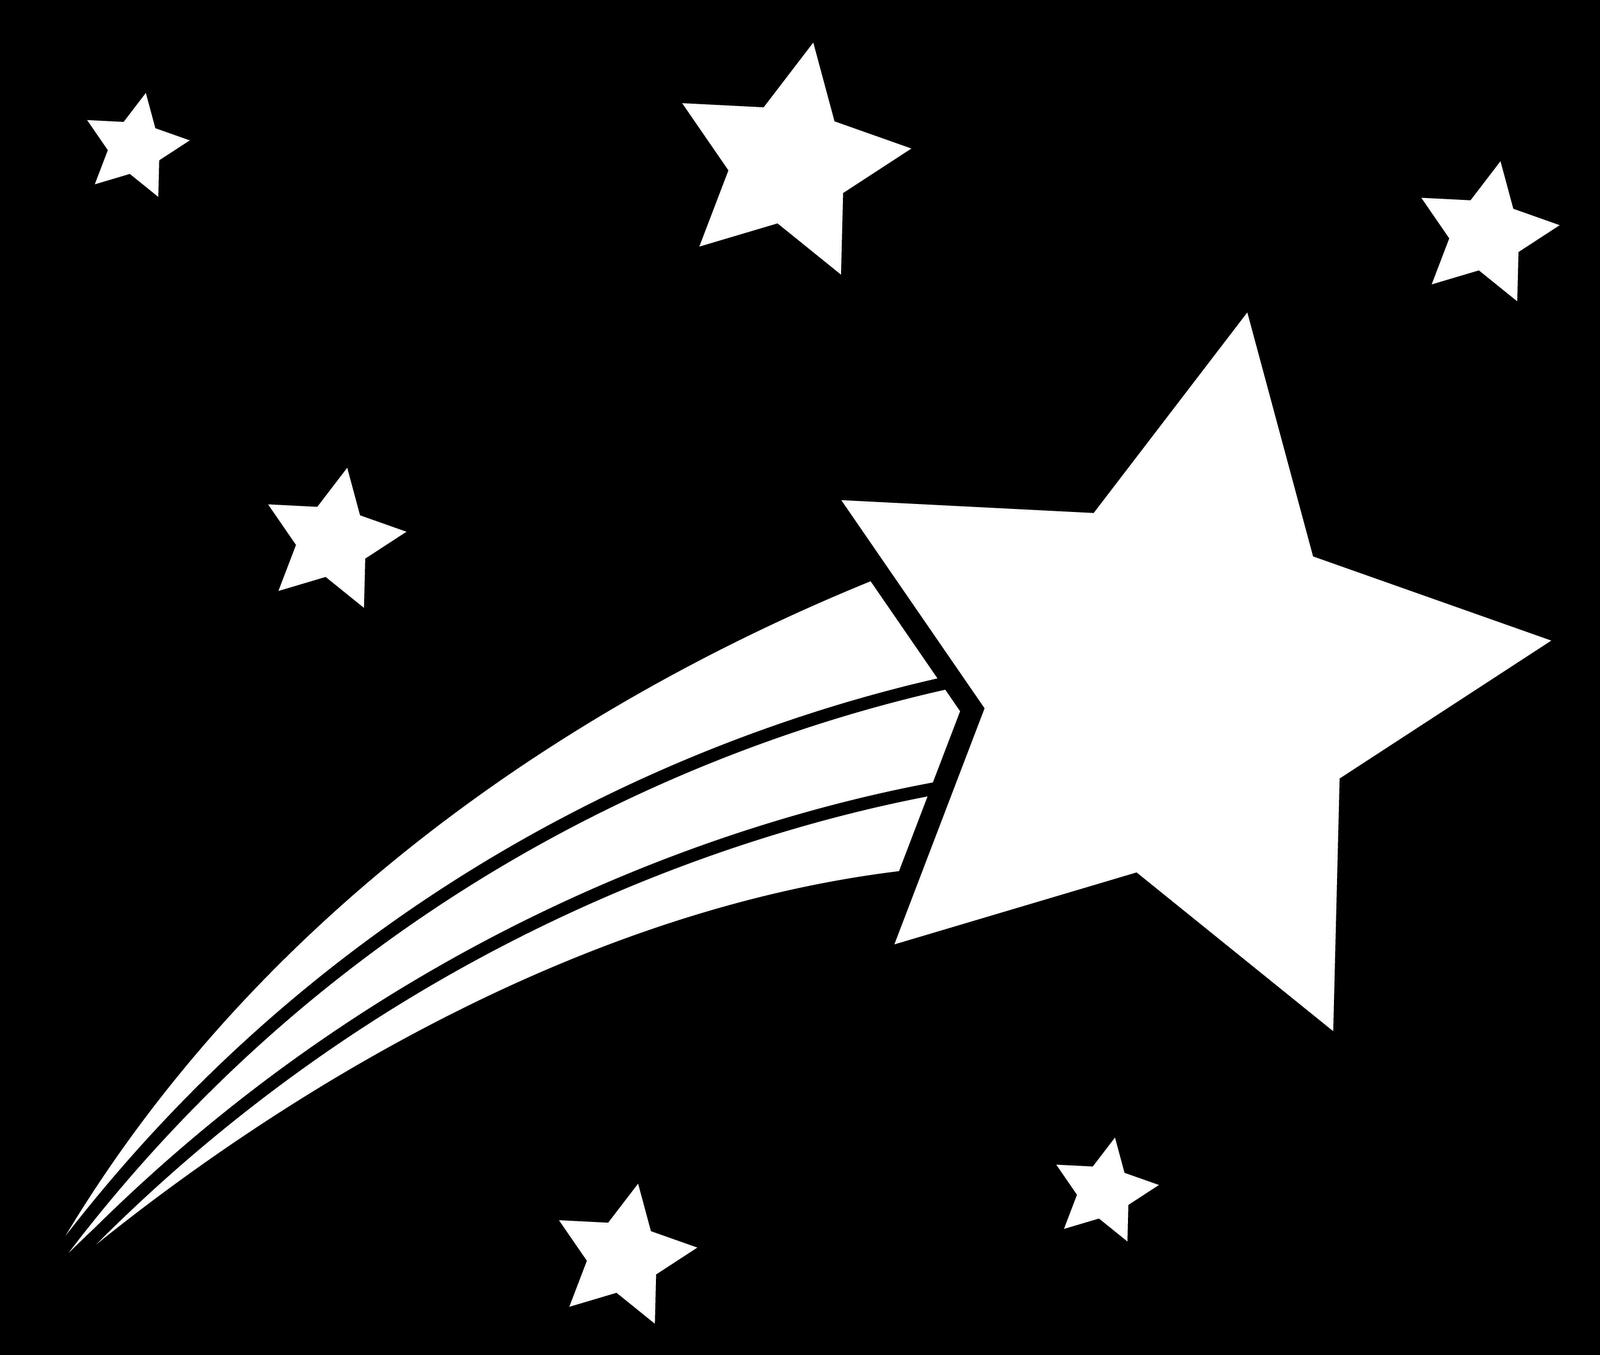 Shooting star clip art black and white clipart panda